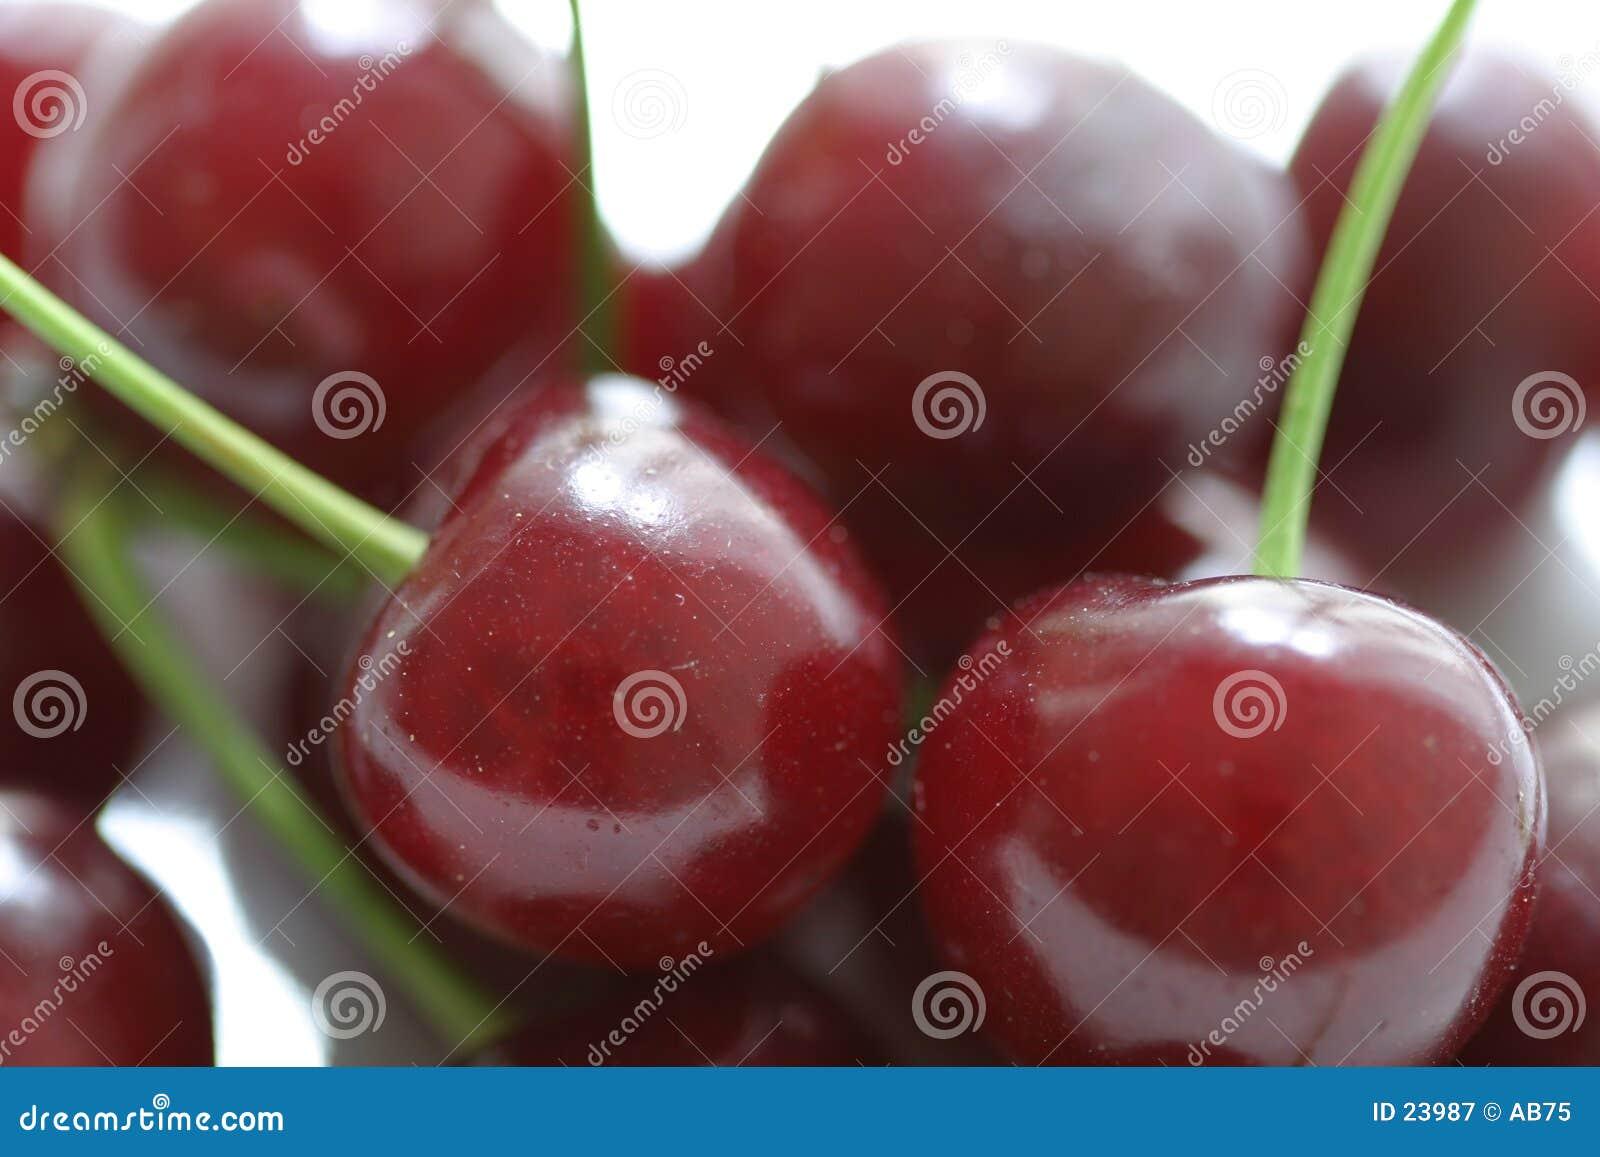 Cherries on stems